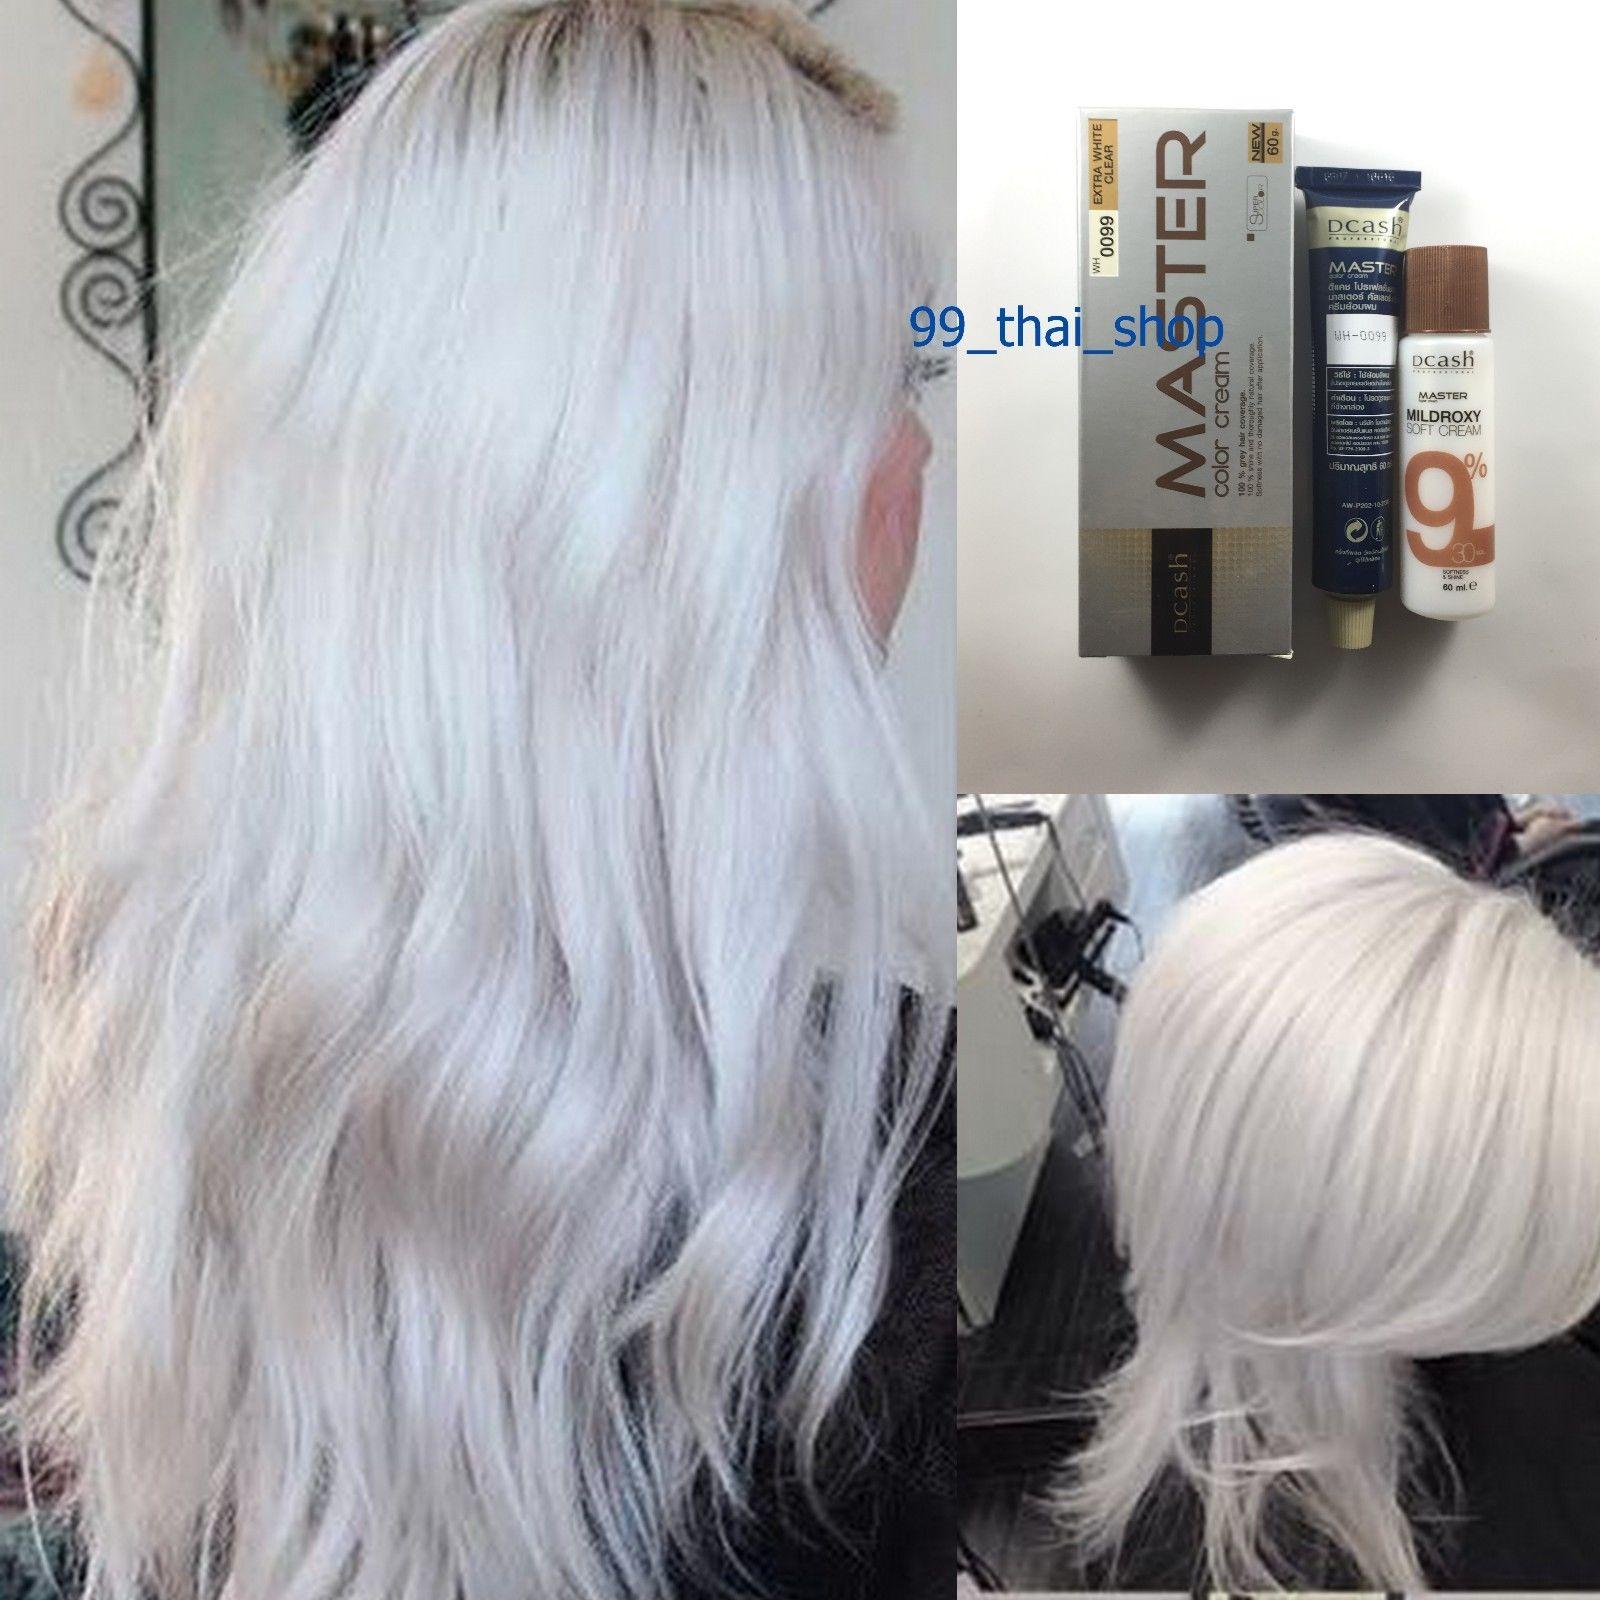 7 99 Dcash Master Permanent Hair Dye Wh0099 Extra White White Color Super Hair Dye Ebay Fashion Permanent Hair Dye White Hair Color Bleach Blonde Hair